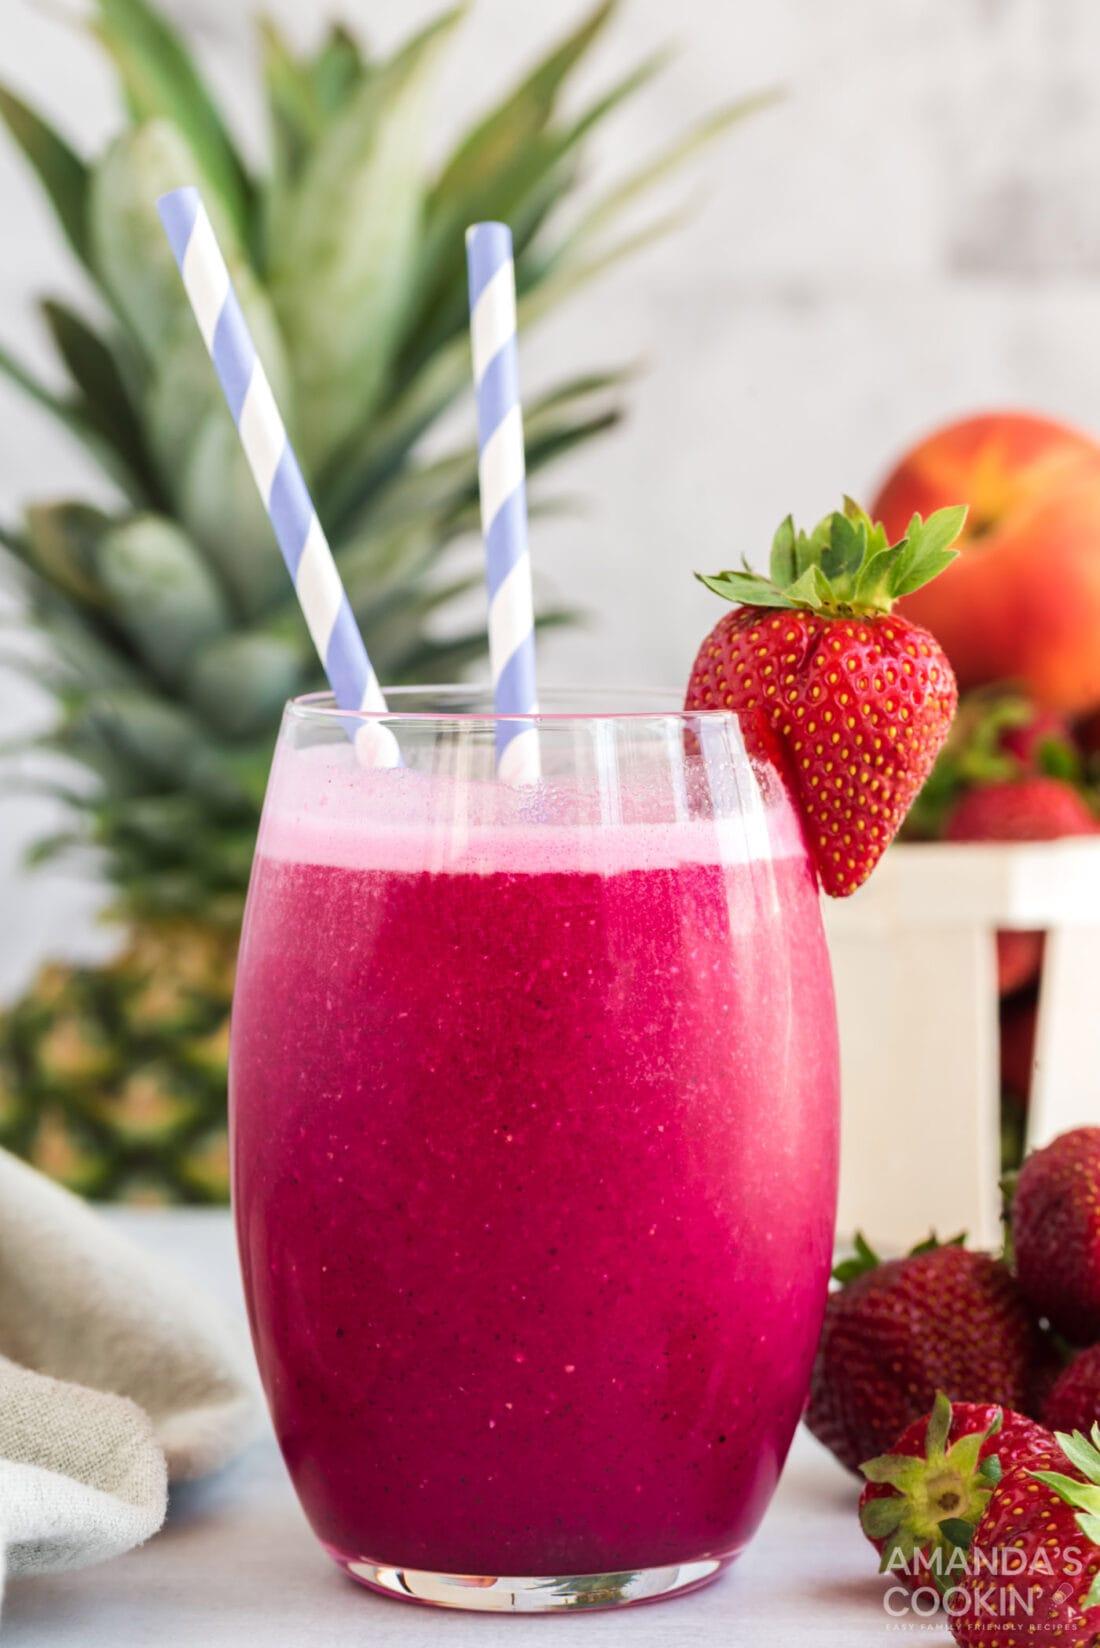 wine slushie with strawberry garnish